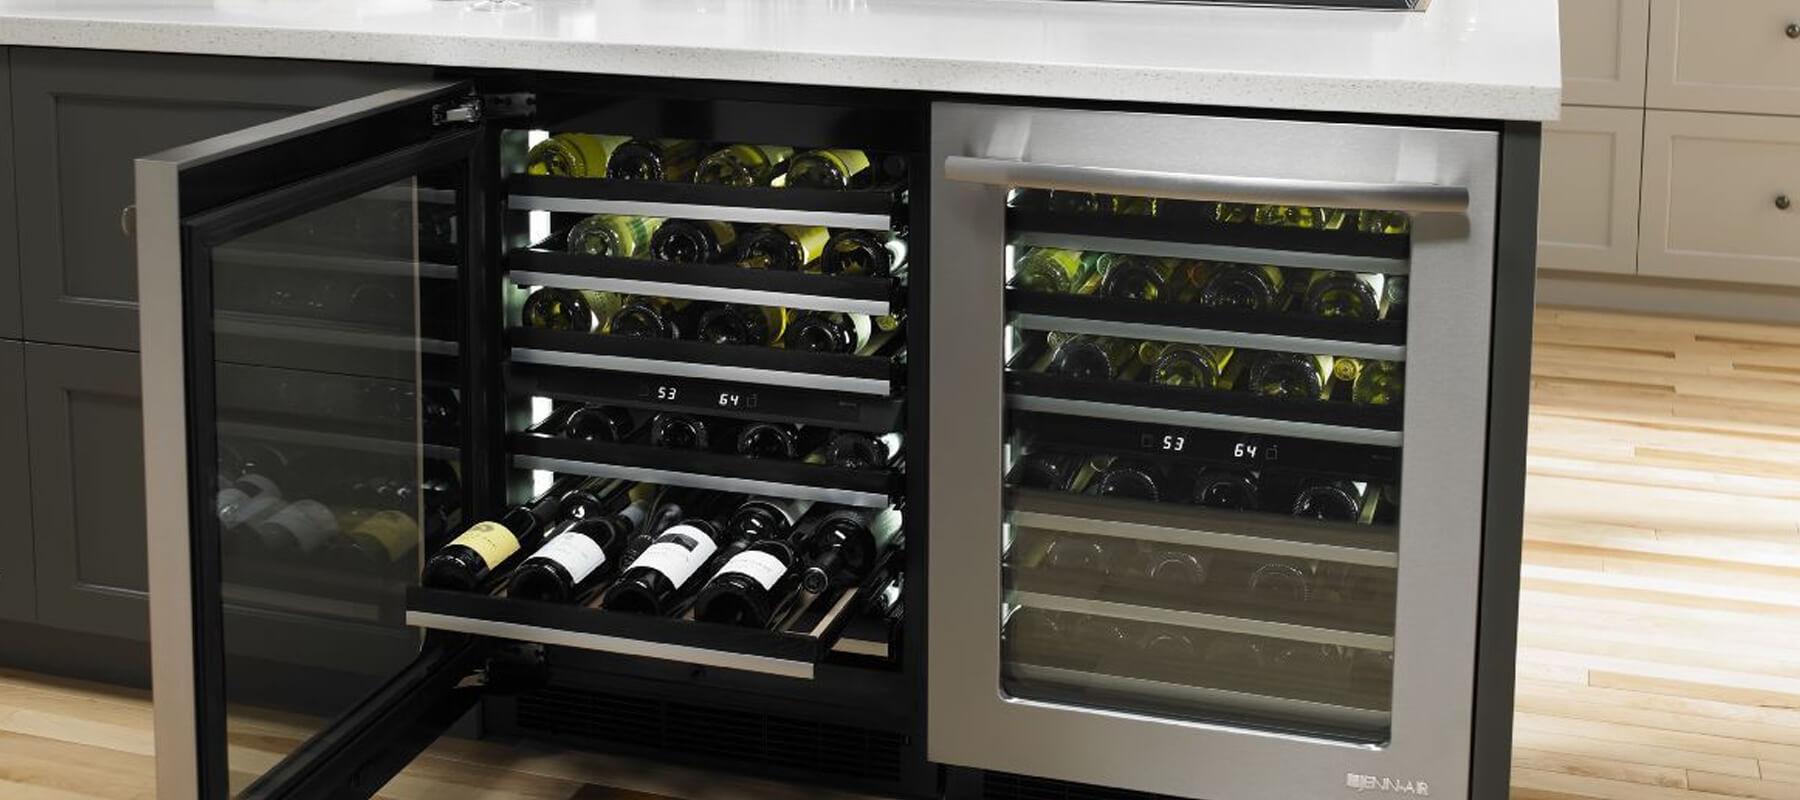 Built in Wine Refrigerator Undercounter La Quinta   Built-in Refrigerator Repair